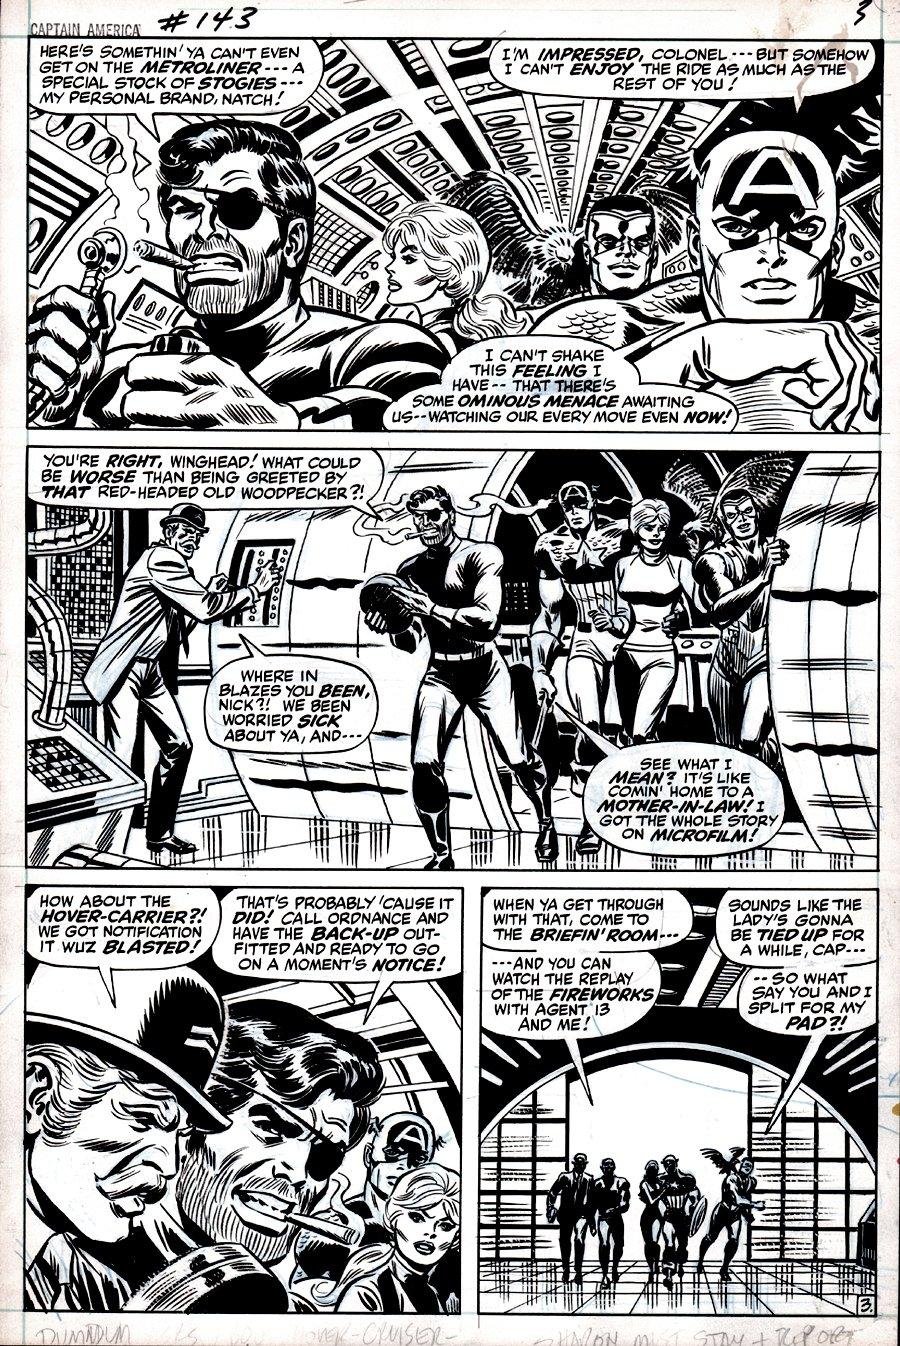 Captain America #143 p 3 (CAP, NICK FURY, FALCON, SHARON CARTER IN EVERY PANEL!) 1971